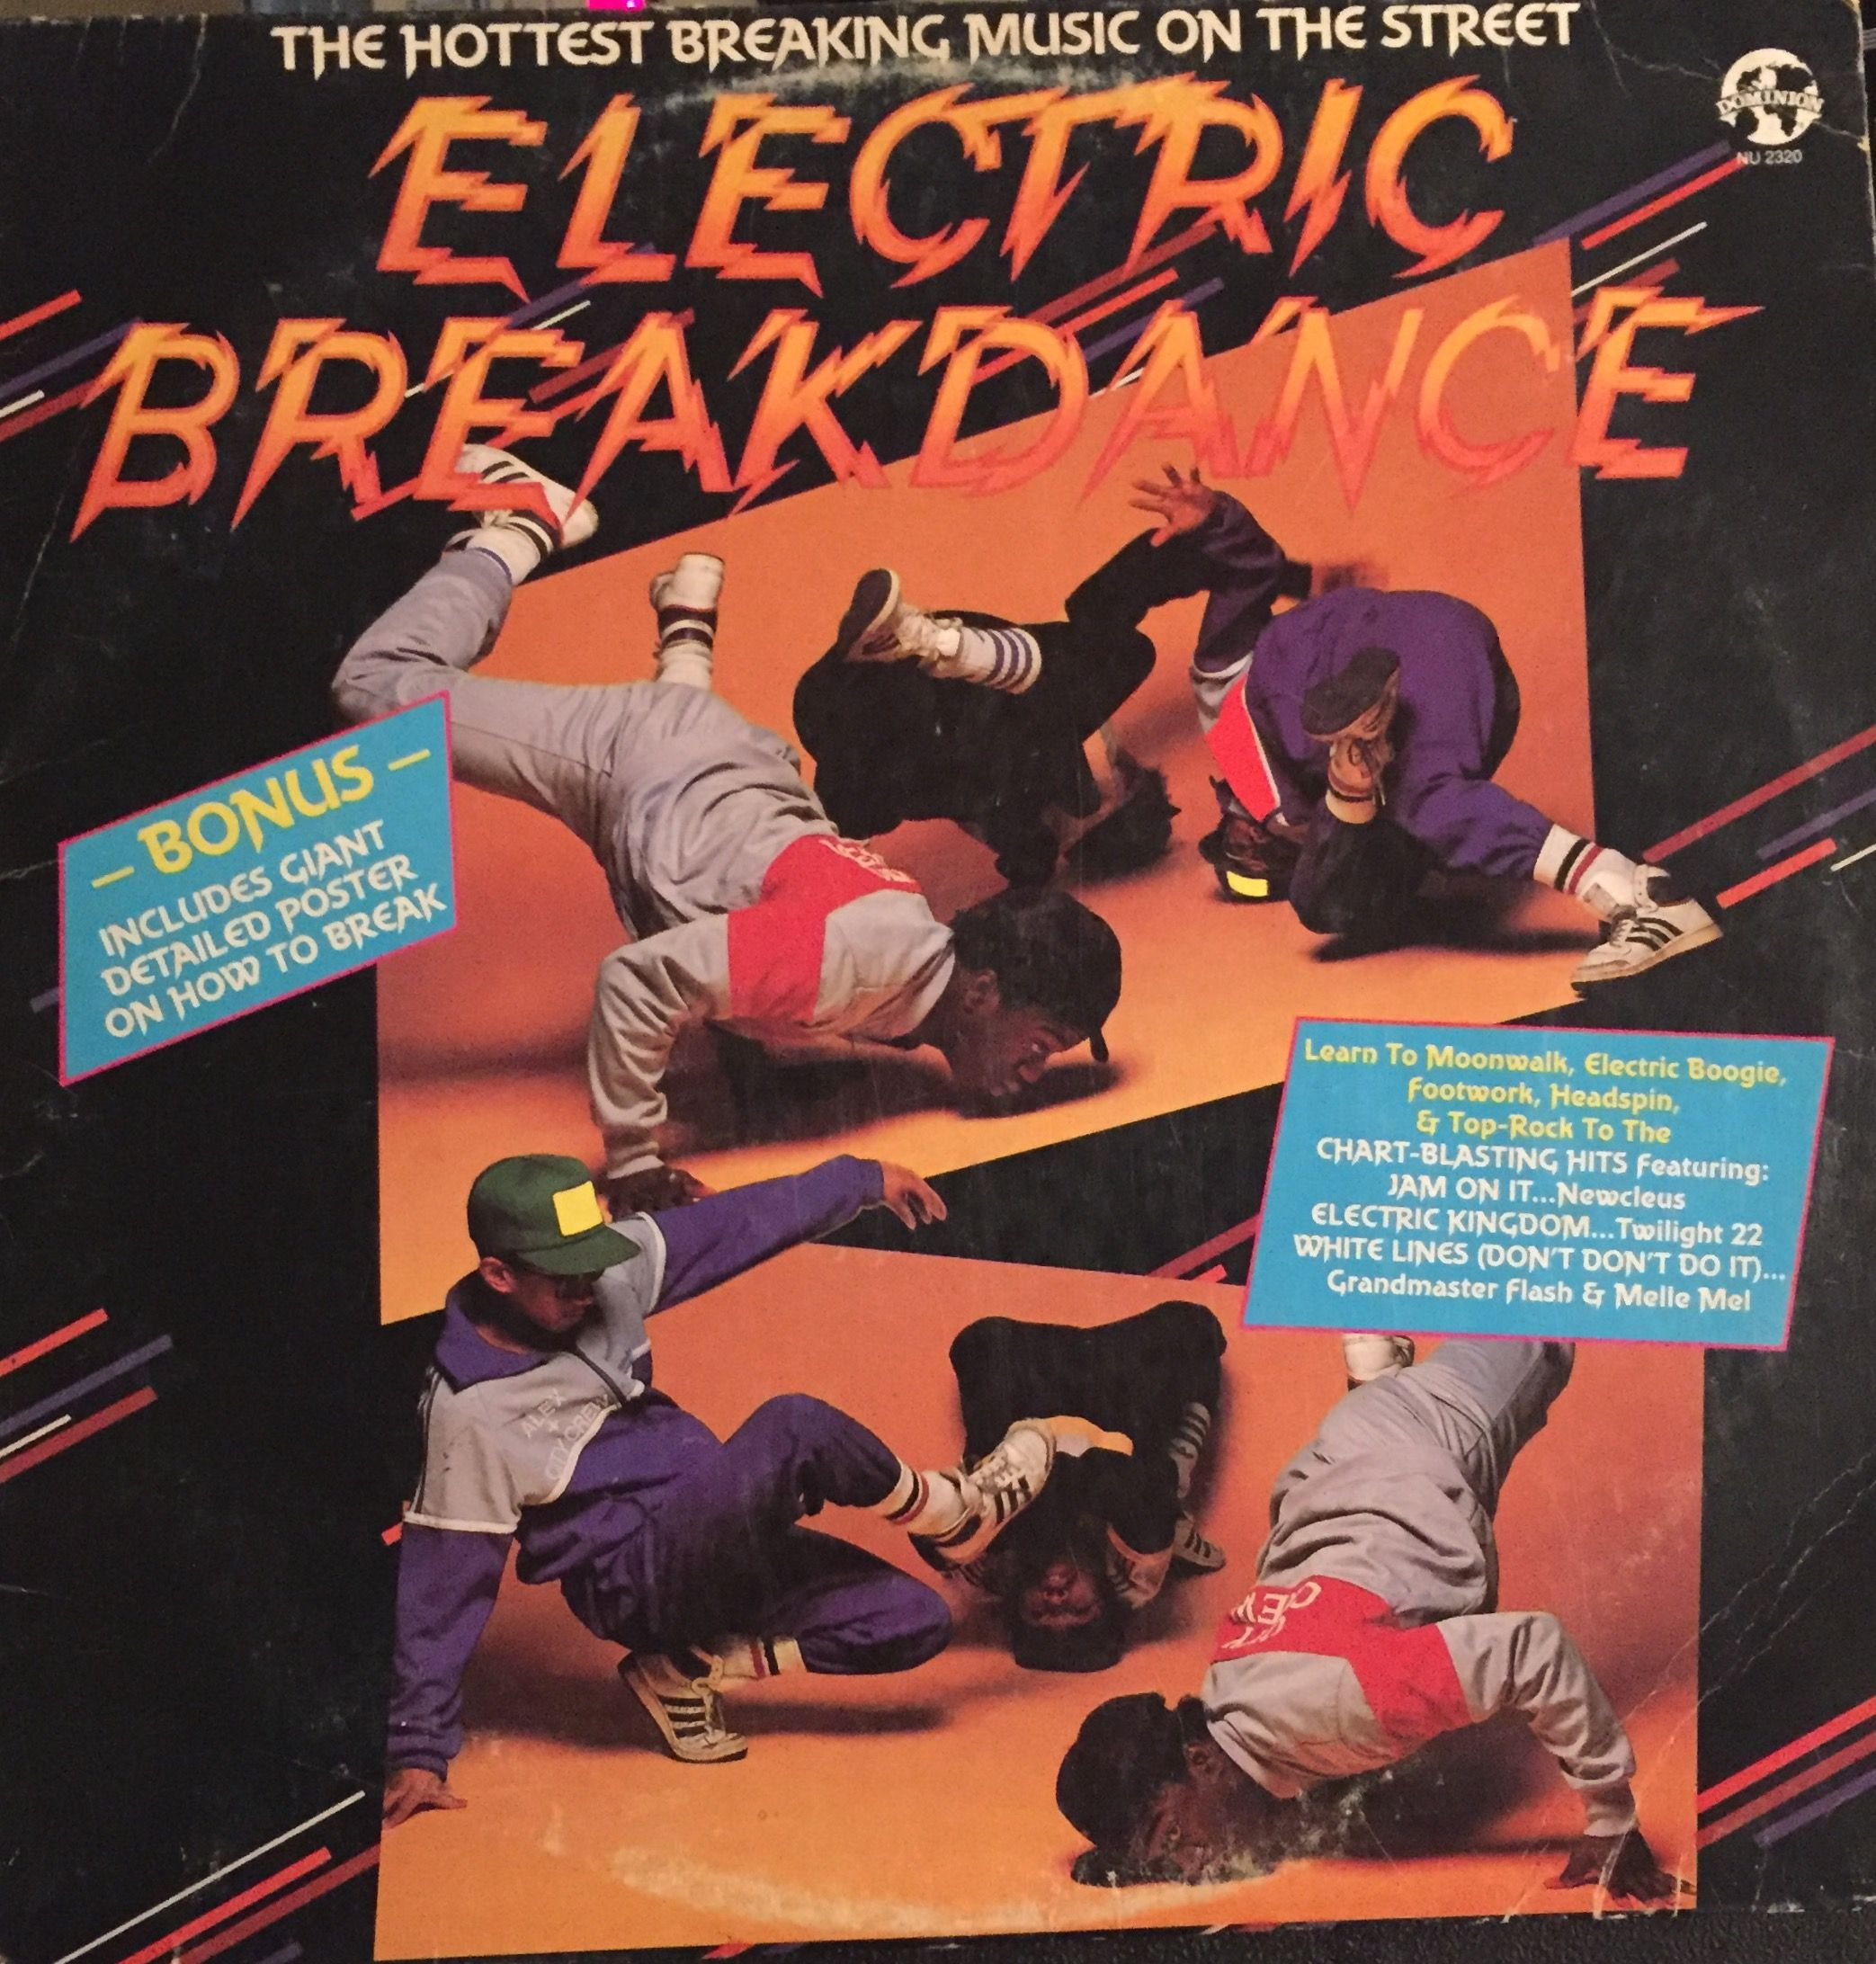 Electric Breakdance' #Ktel records 1984  hip-hop vinyl #rap